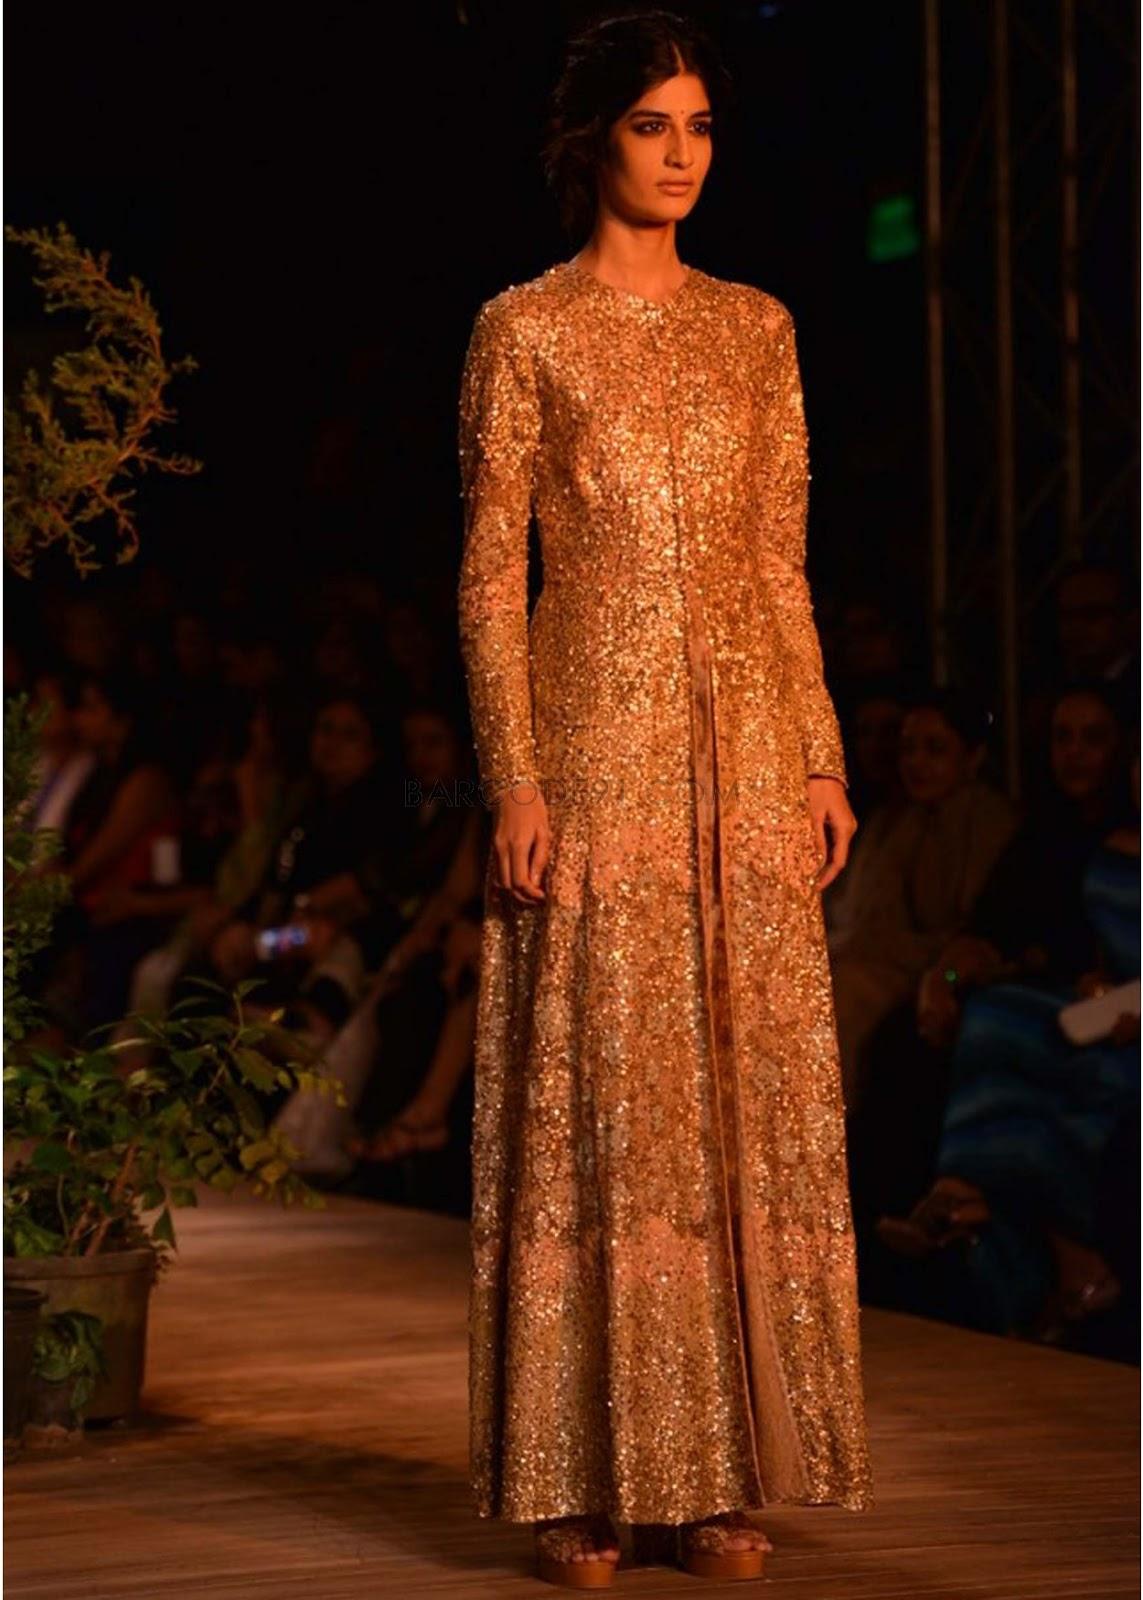 Sabyasachi Collection at PCJ Delhi Couture Week 2013 ... Sabyasachi Anarkali Suits Collection 2013